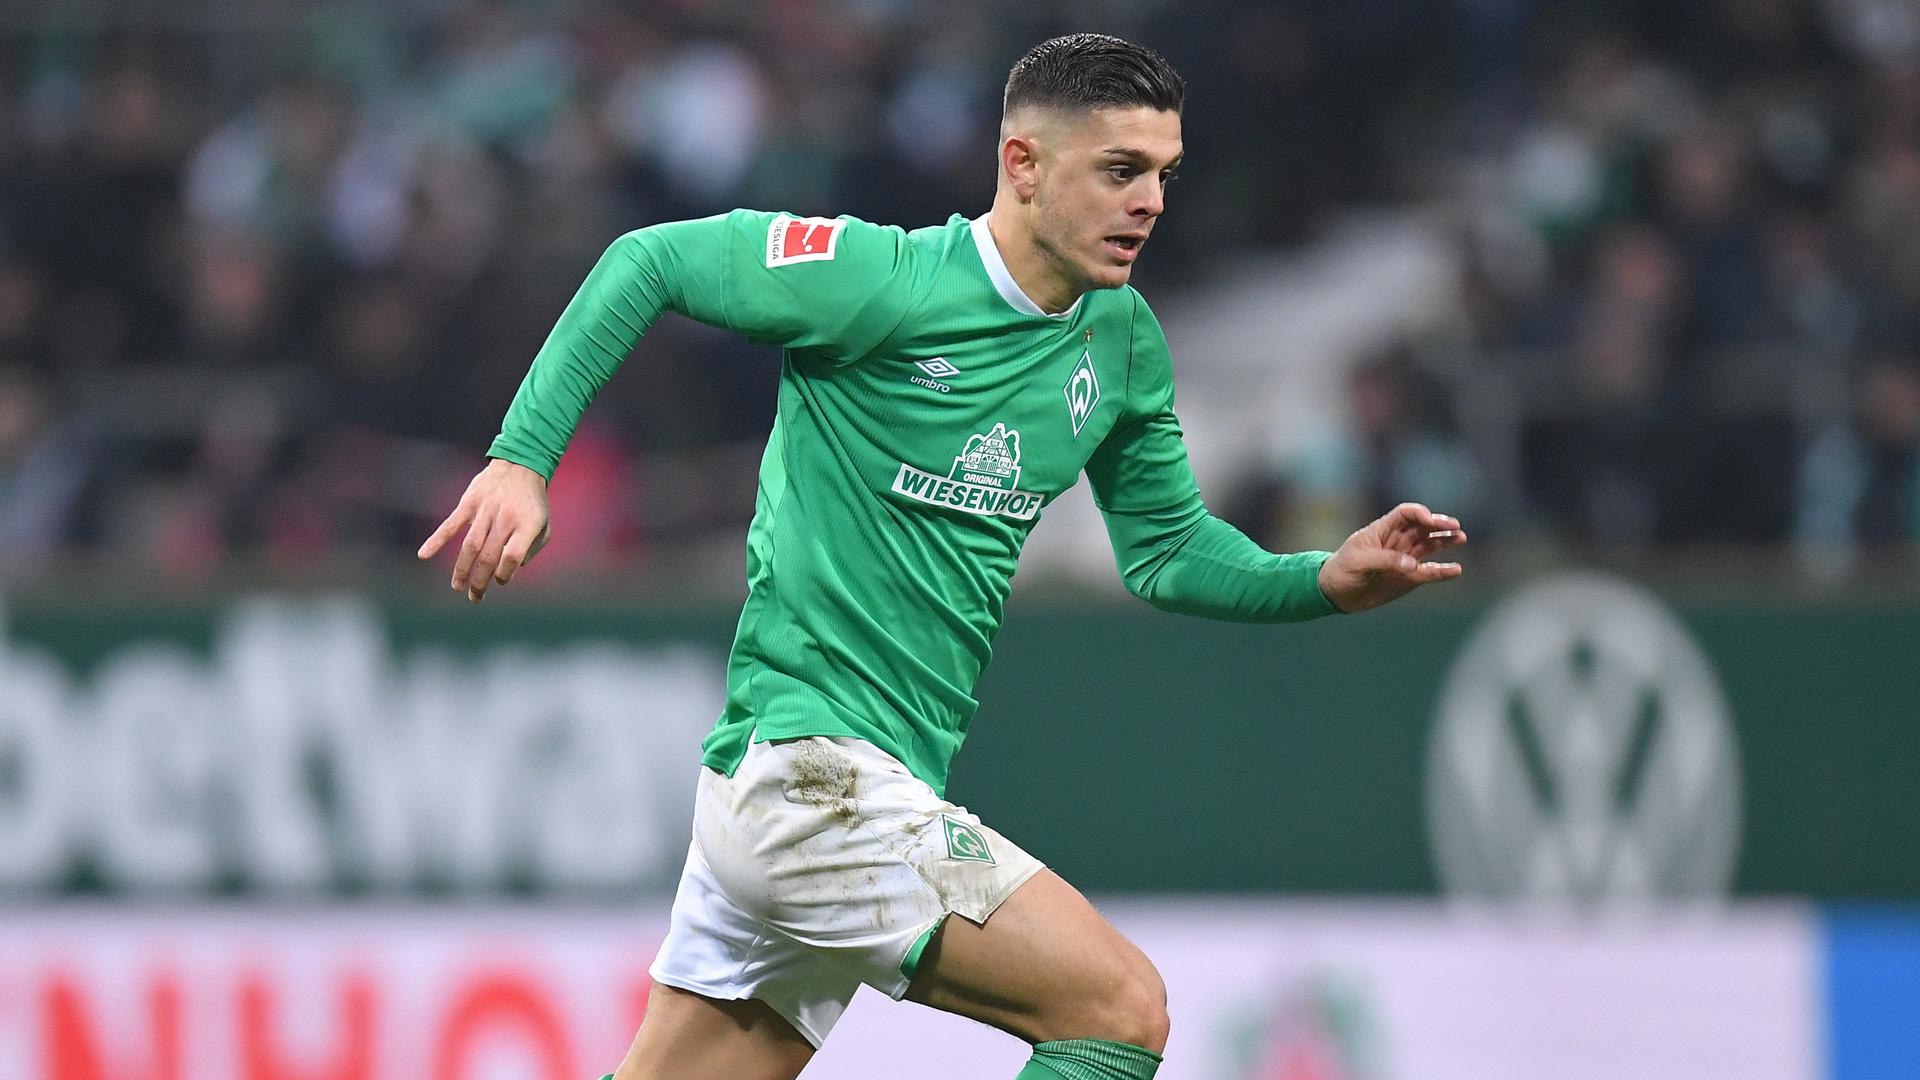 Bremen Leverkusen Live Stream